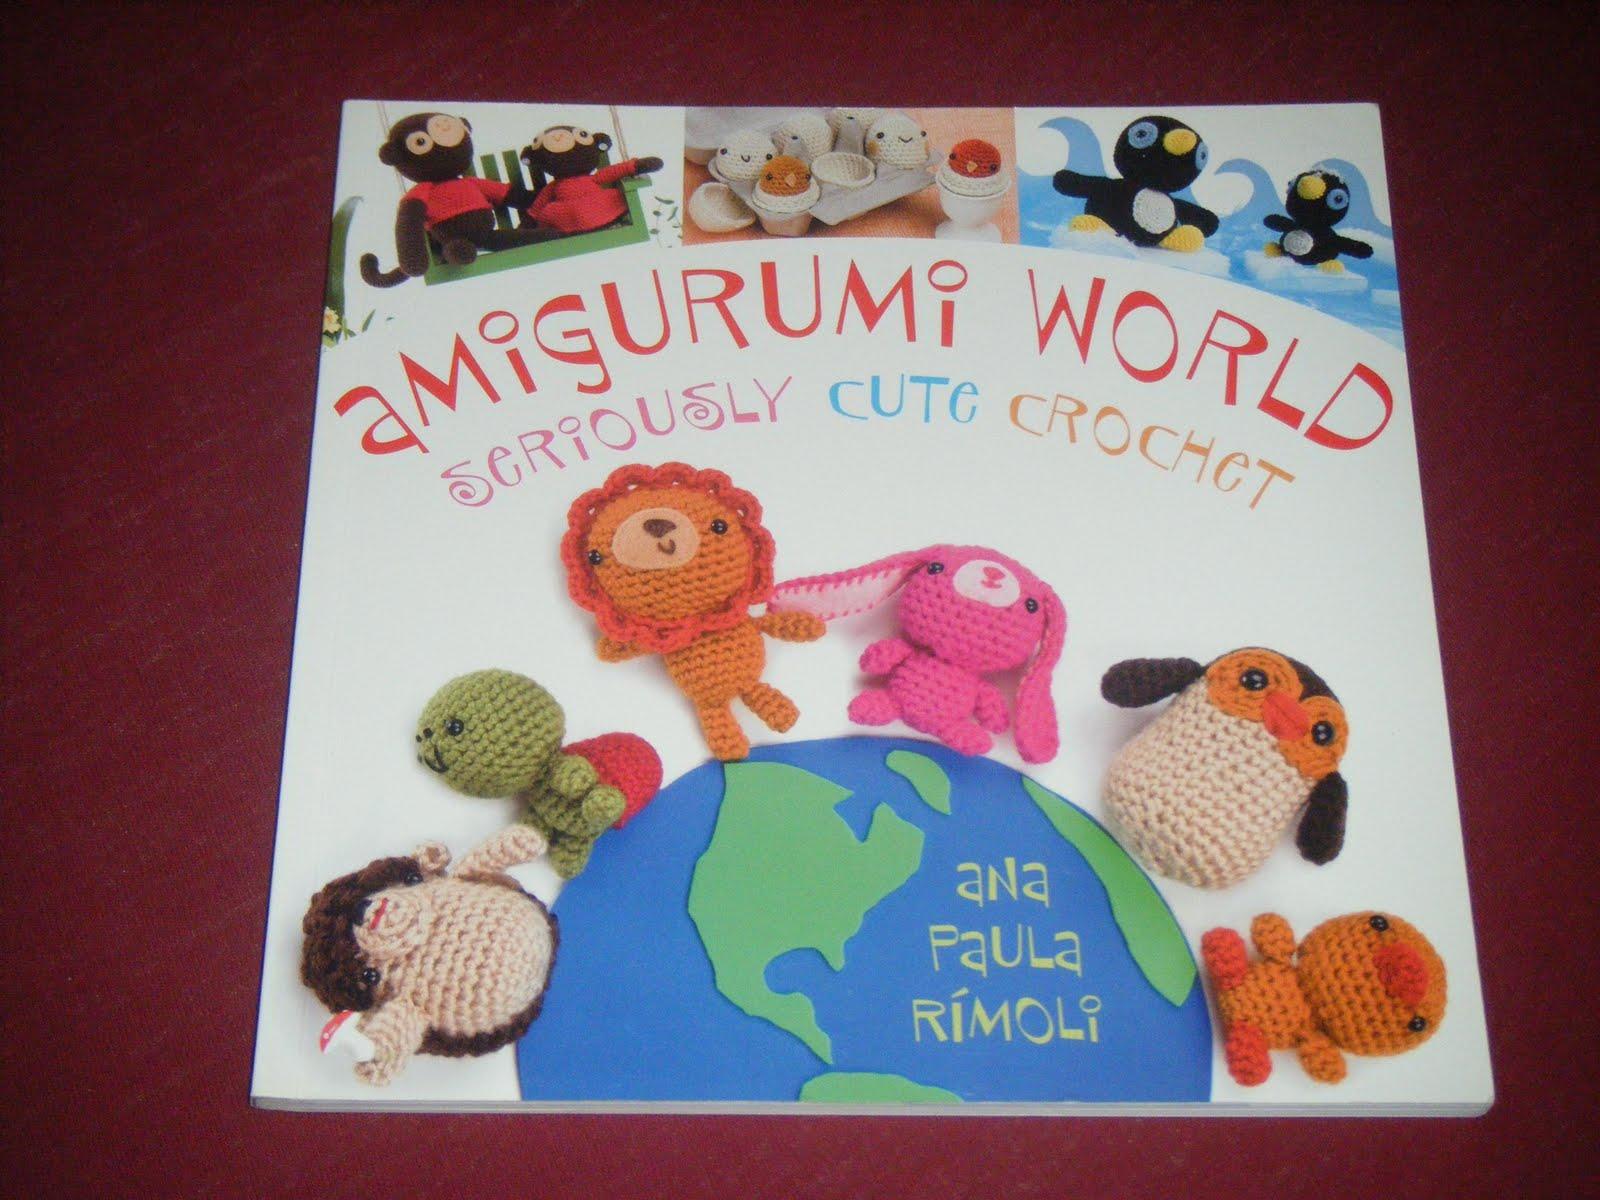 Amigurumi World Seriously Cute Crochet : The glorious books!: Amigurumi world - seriously cute crochet